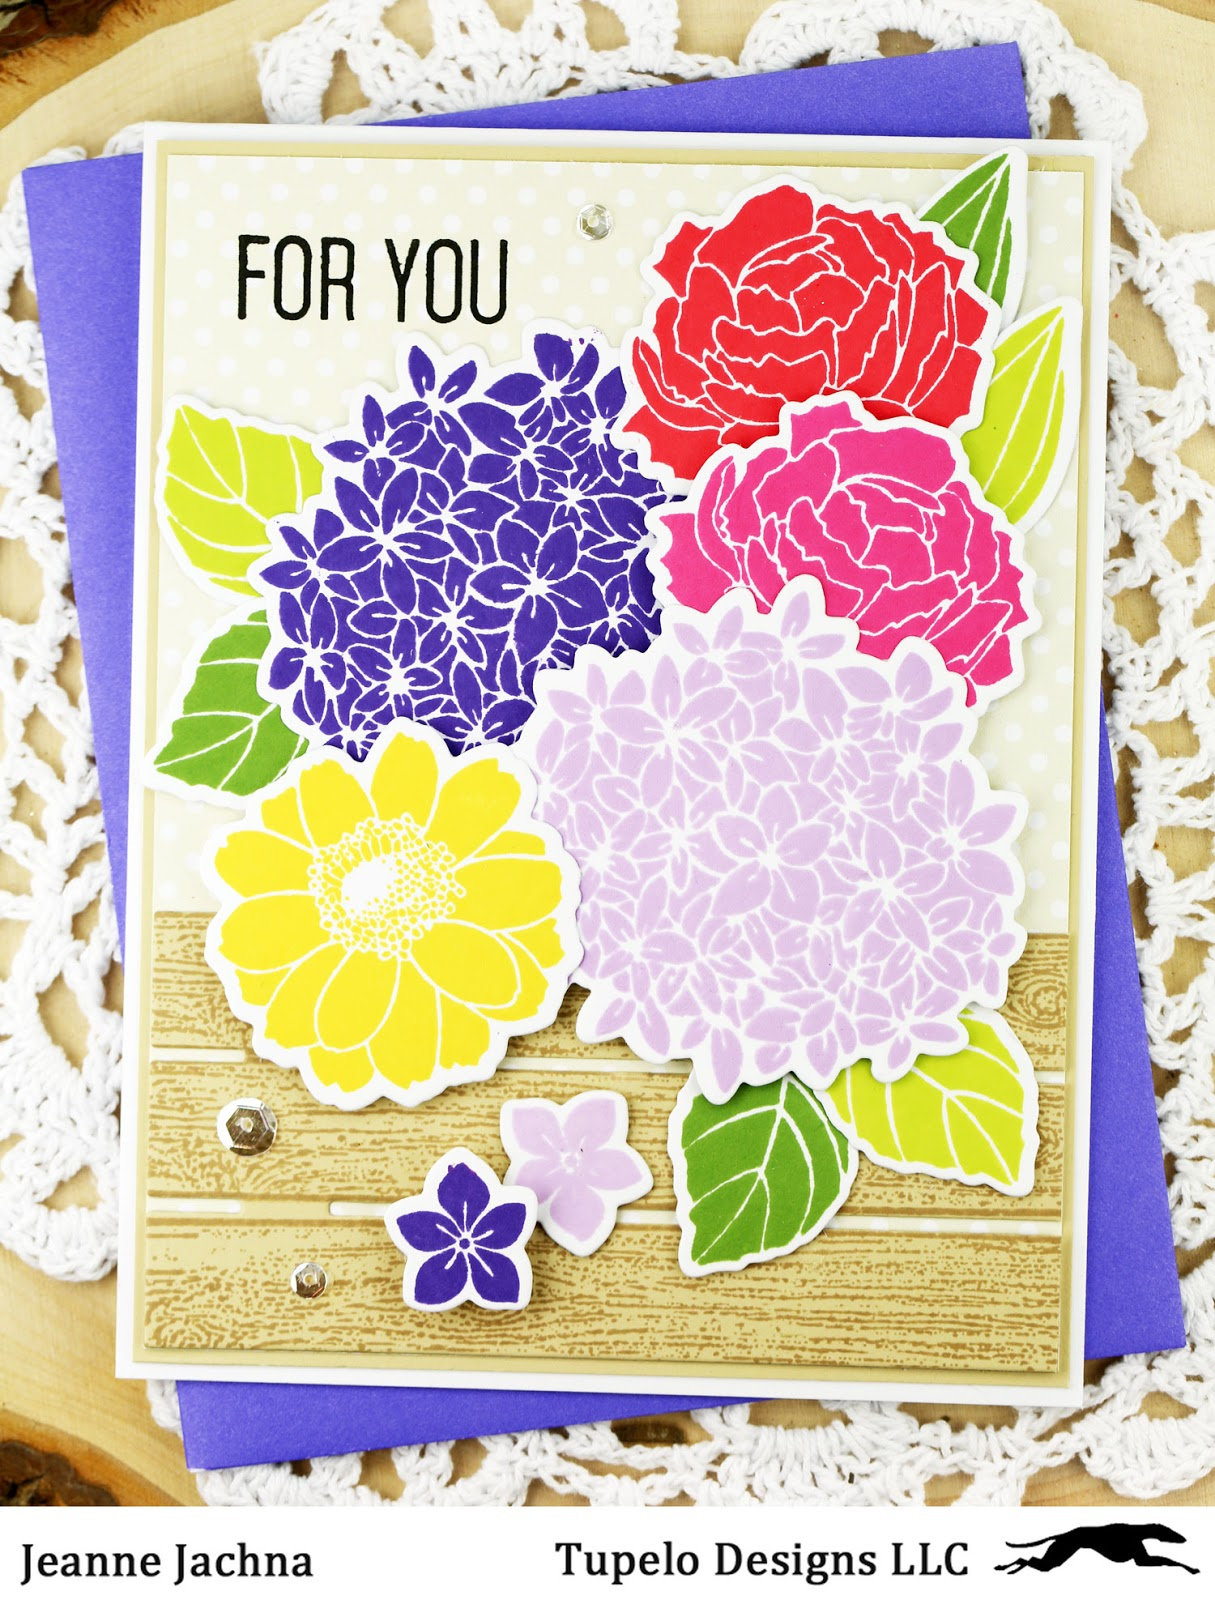 A Kept Life Tupelo Designs LLC Flowers For You